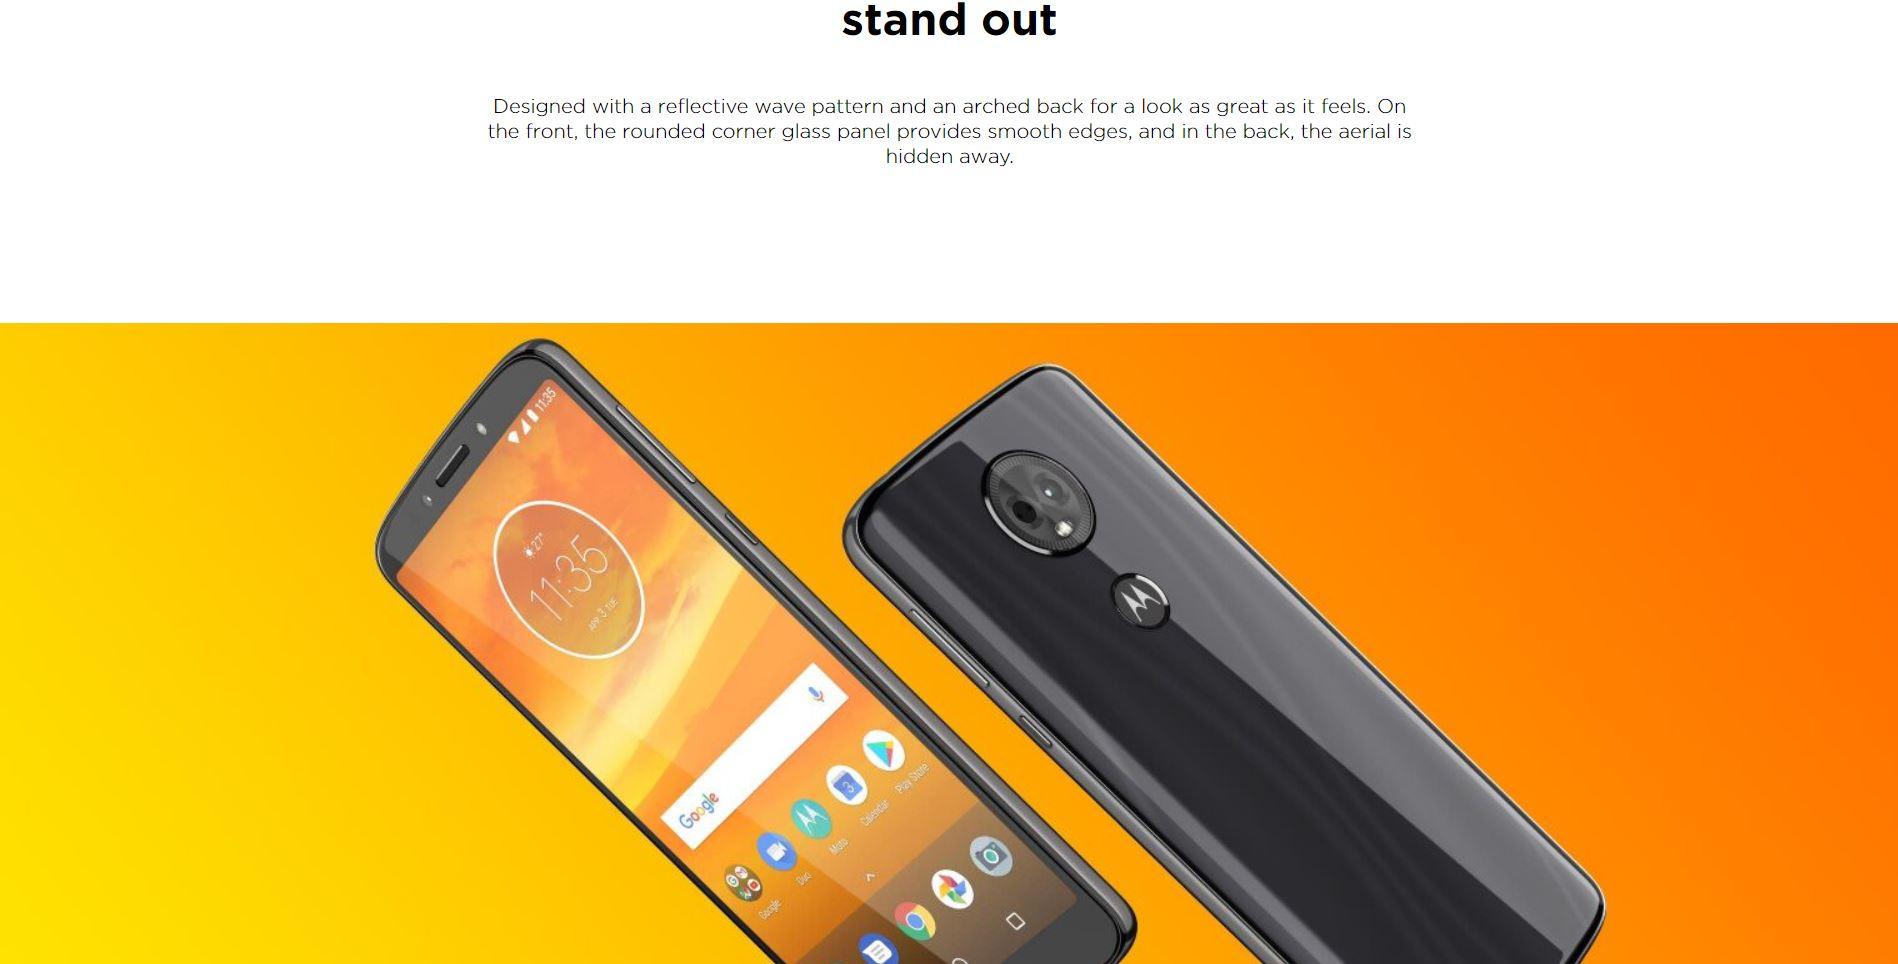 Motorola Moto E5 Plus 16GB Sim Free / Unlocked Mobile Phone